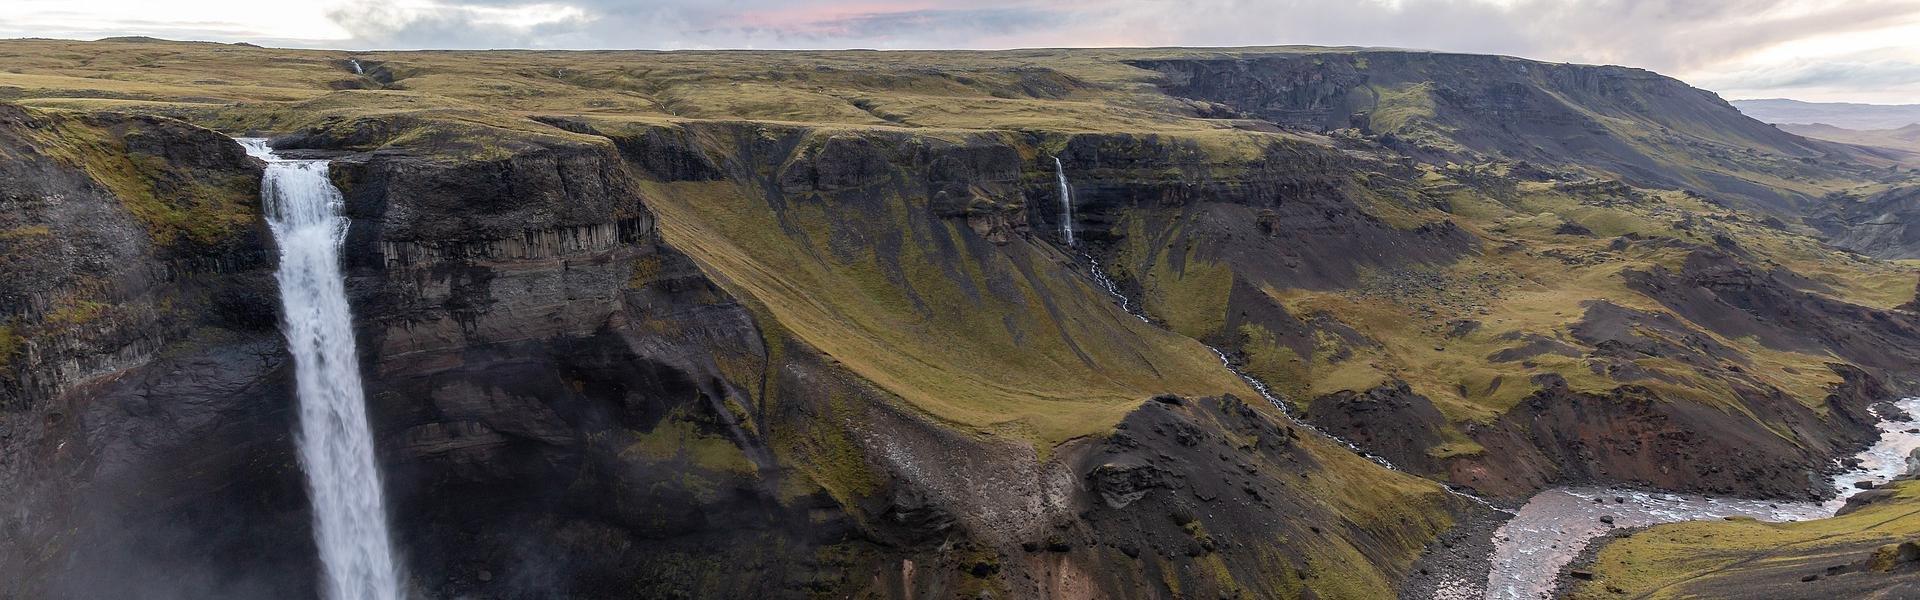 Campervakantie IJsland